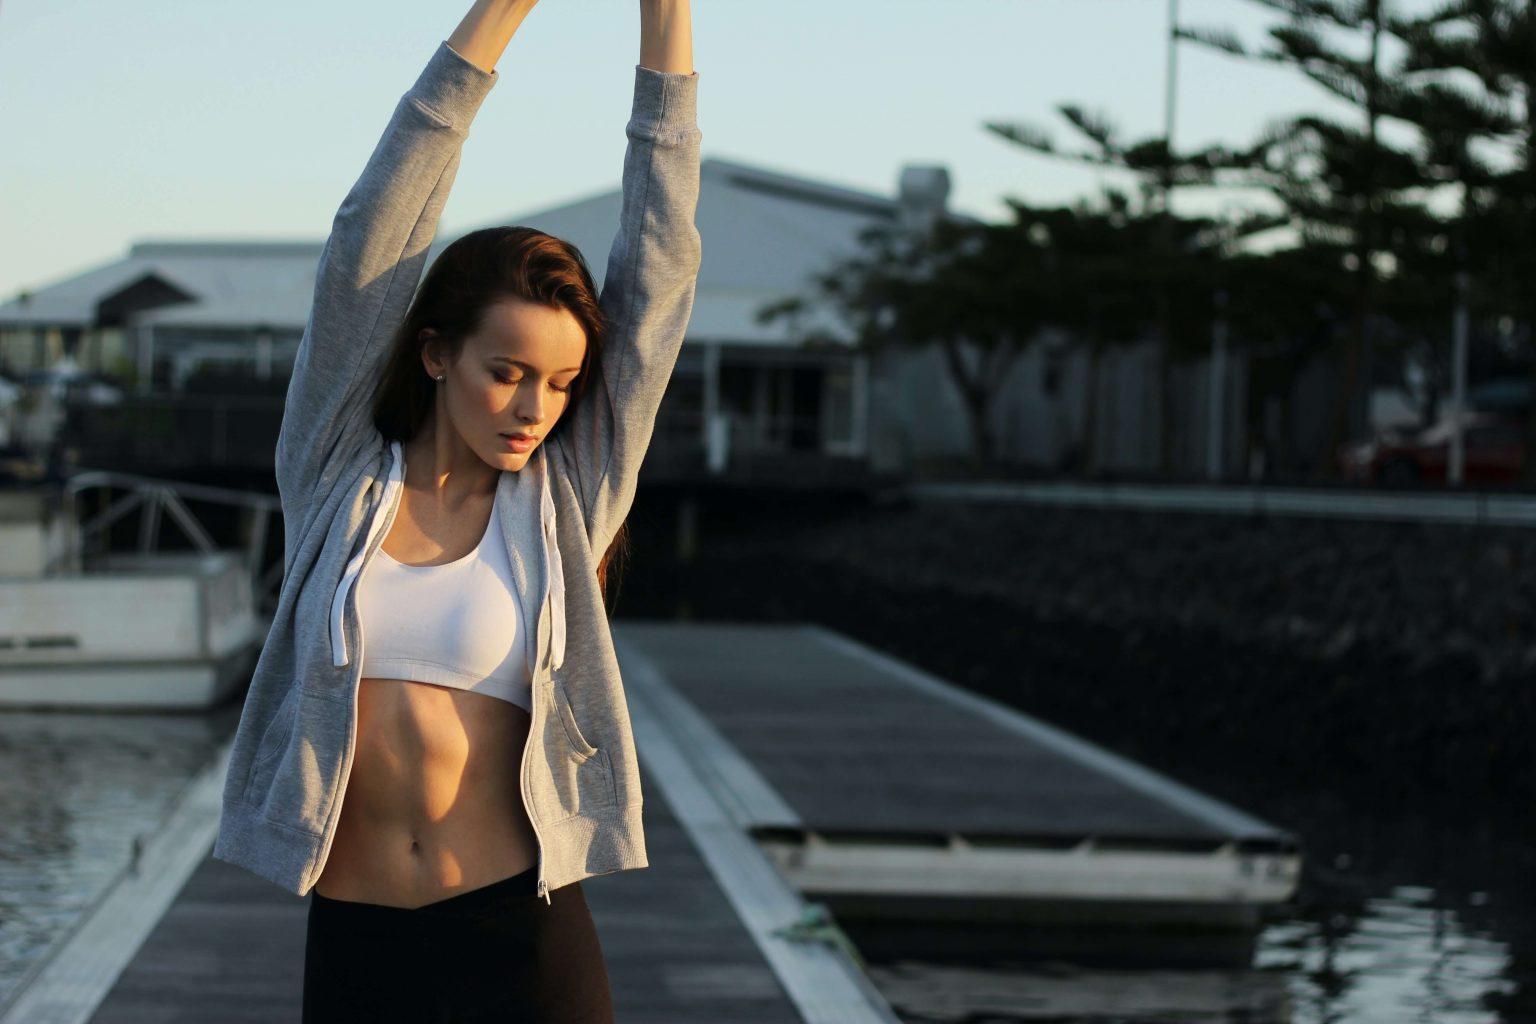 a lady stretching